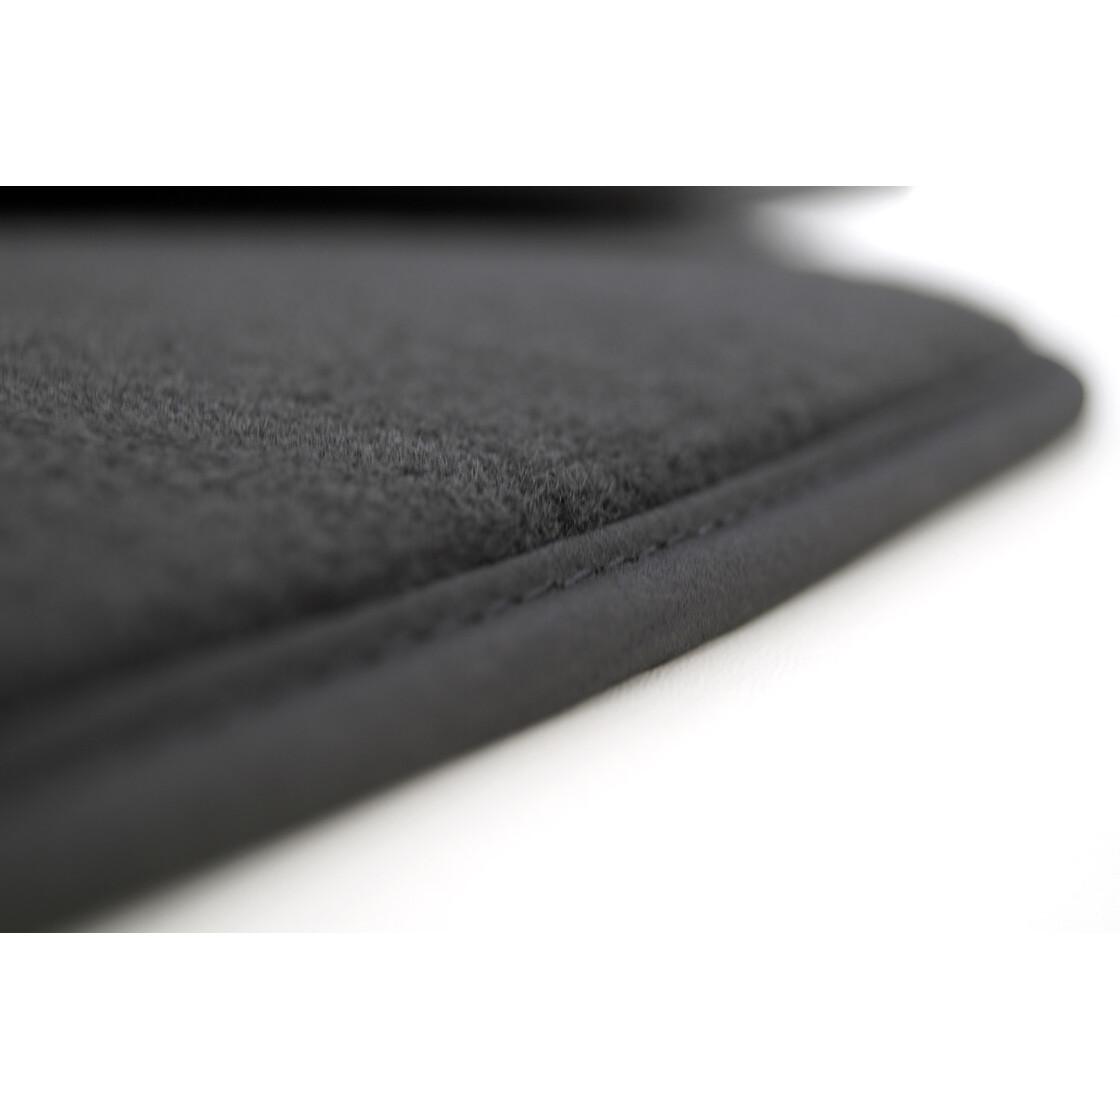 fu matten audi a1 a1 sportback original qualit t velours auto matten tunin. Black Bedroom Furniture Sets. Home Design Ideas